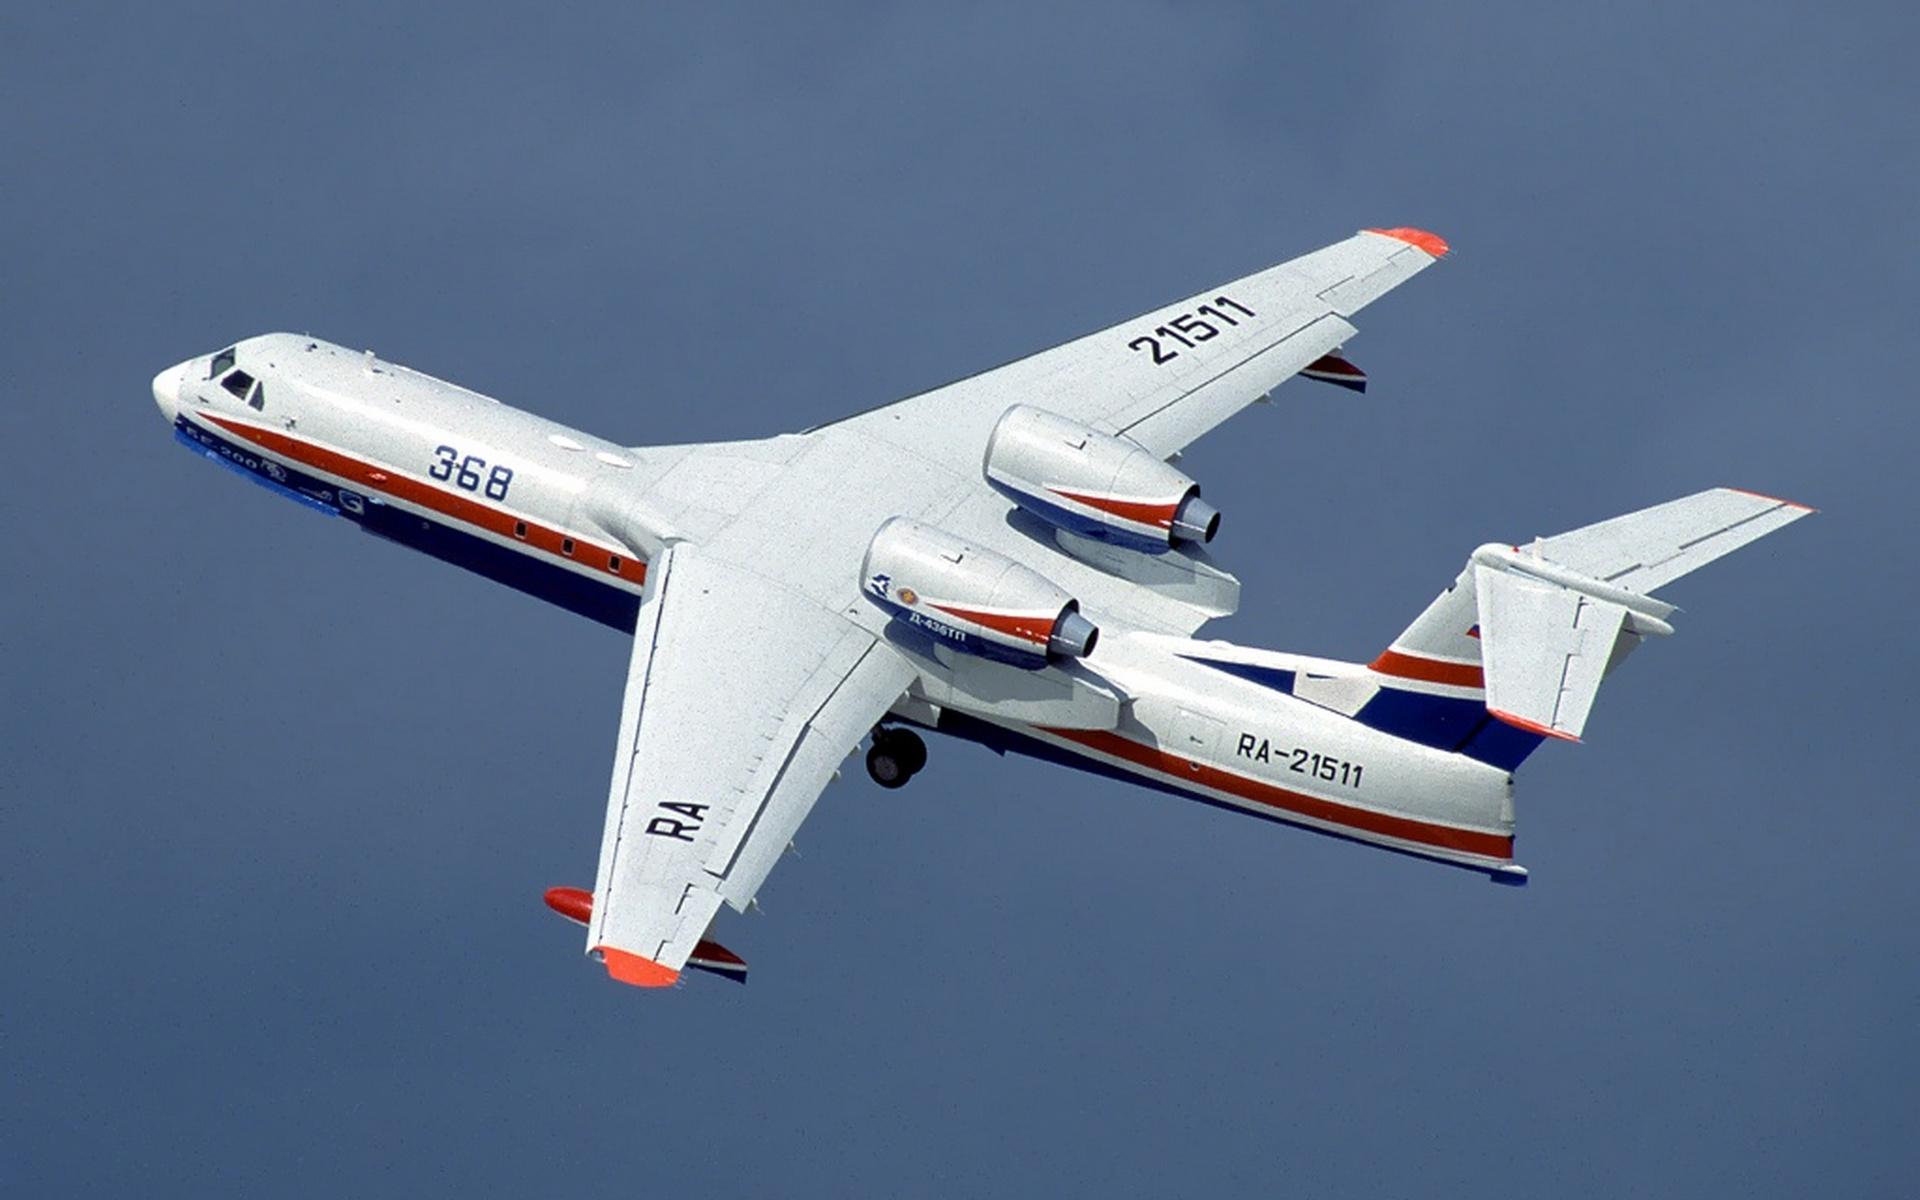 фото самолета бе 12 обои на рабочий стол № 249156 без смс